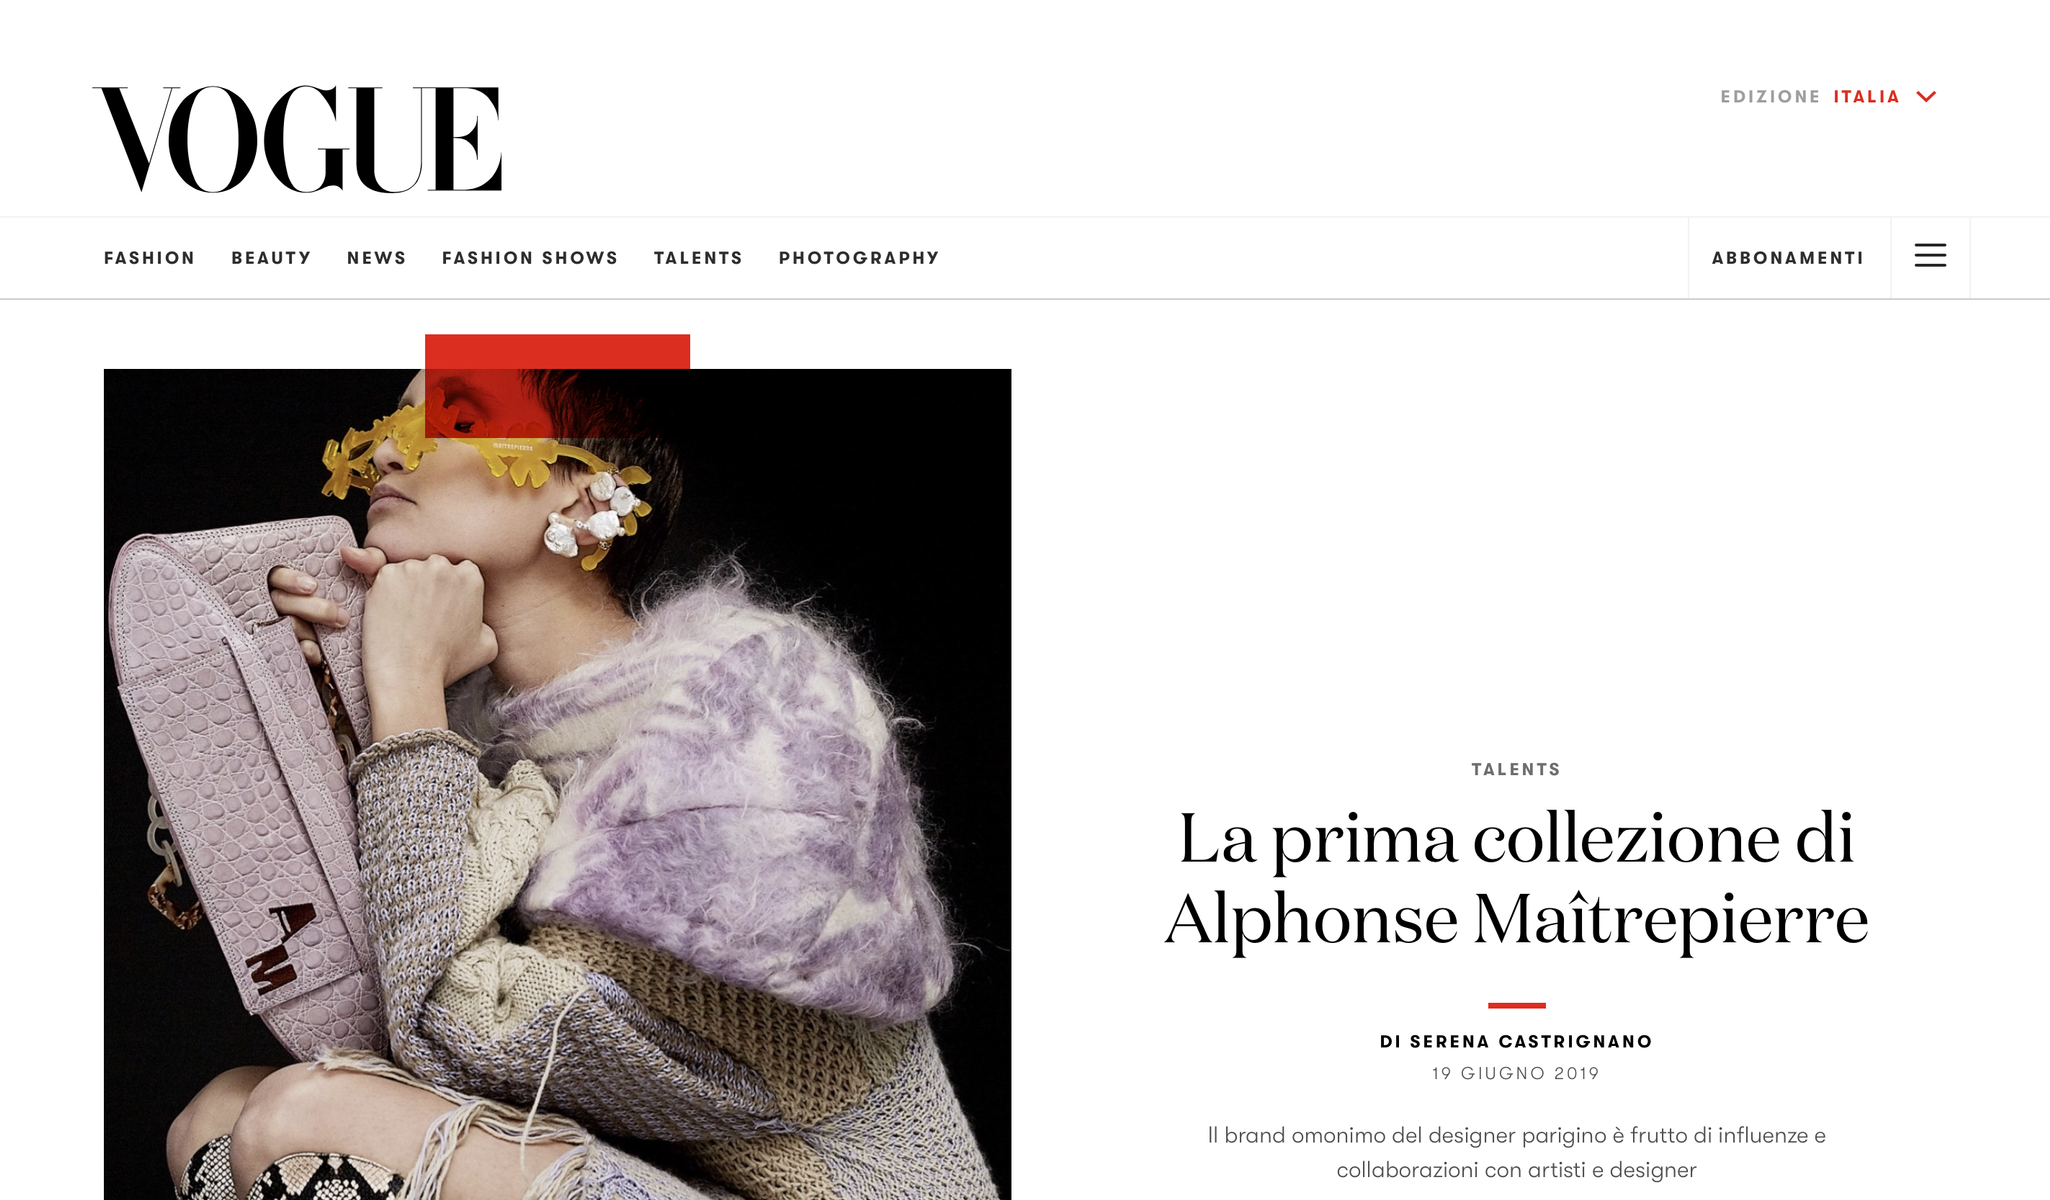 ALPHONSE-MAITREPIERRE - VOGUE ITALIA